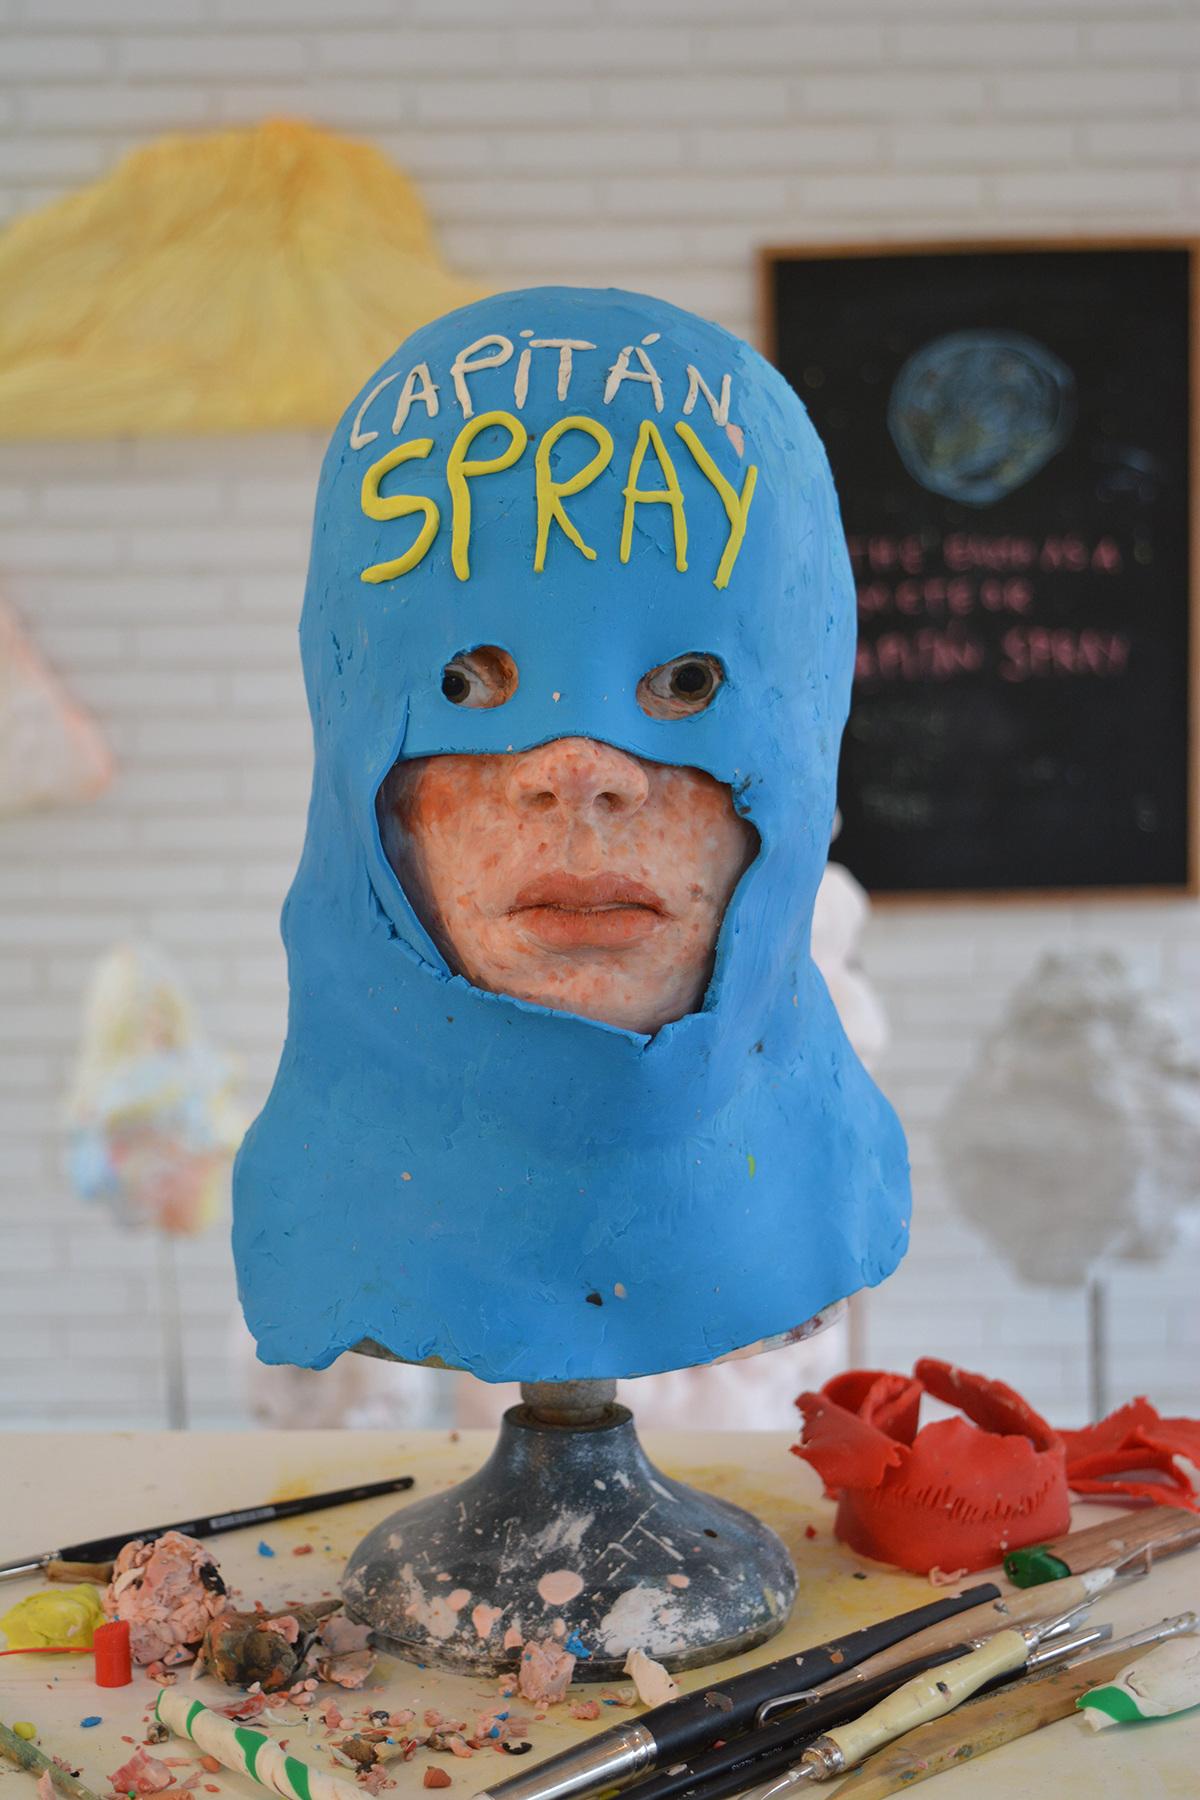 Capitán Spray  Detalle de estudio, plastilina tamaño natural, 2014